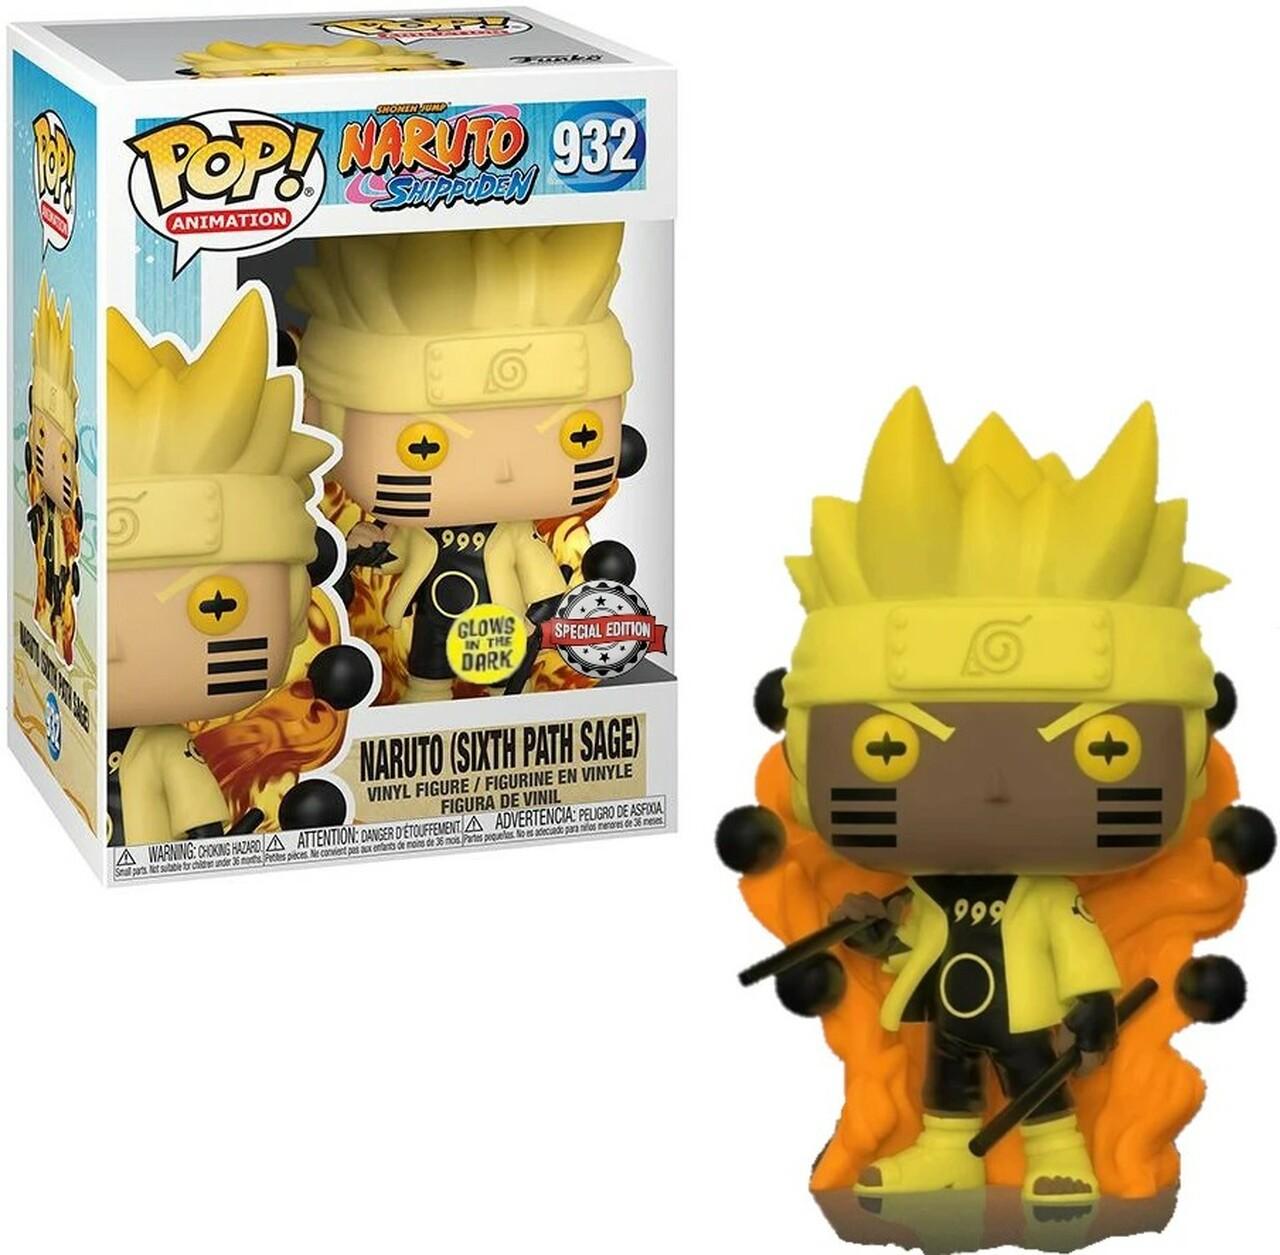 Naruto Six Path Sage GITD #932